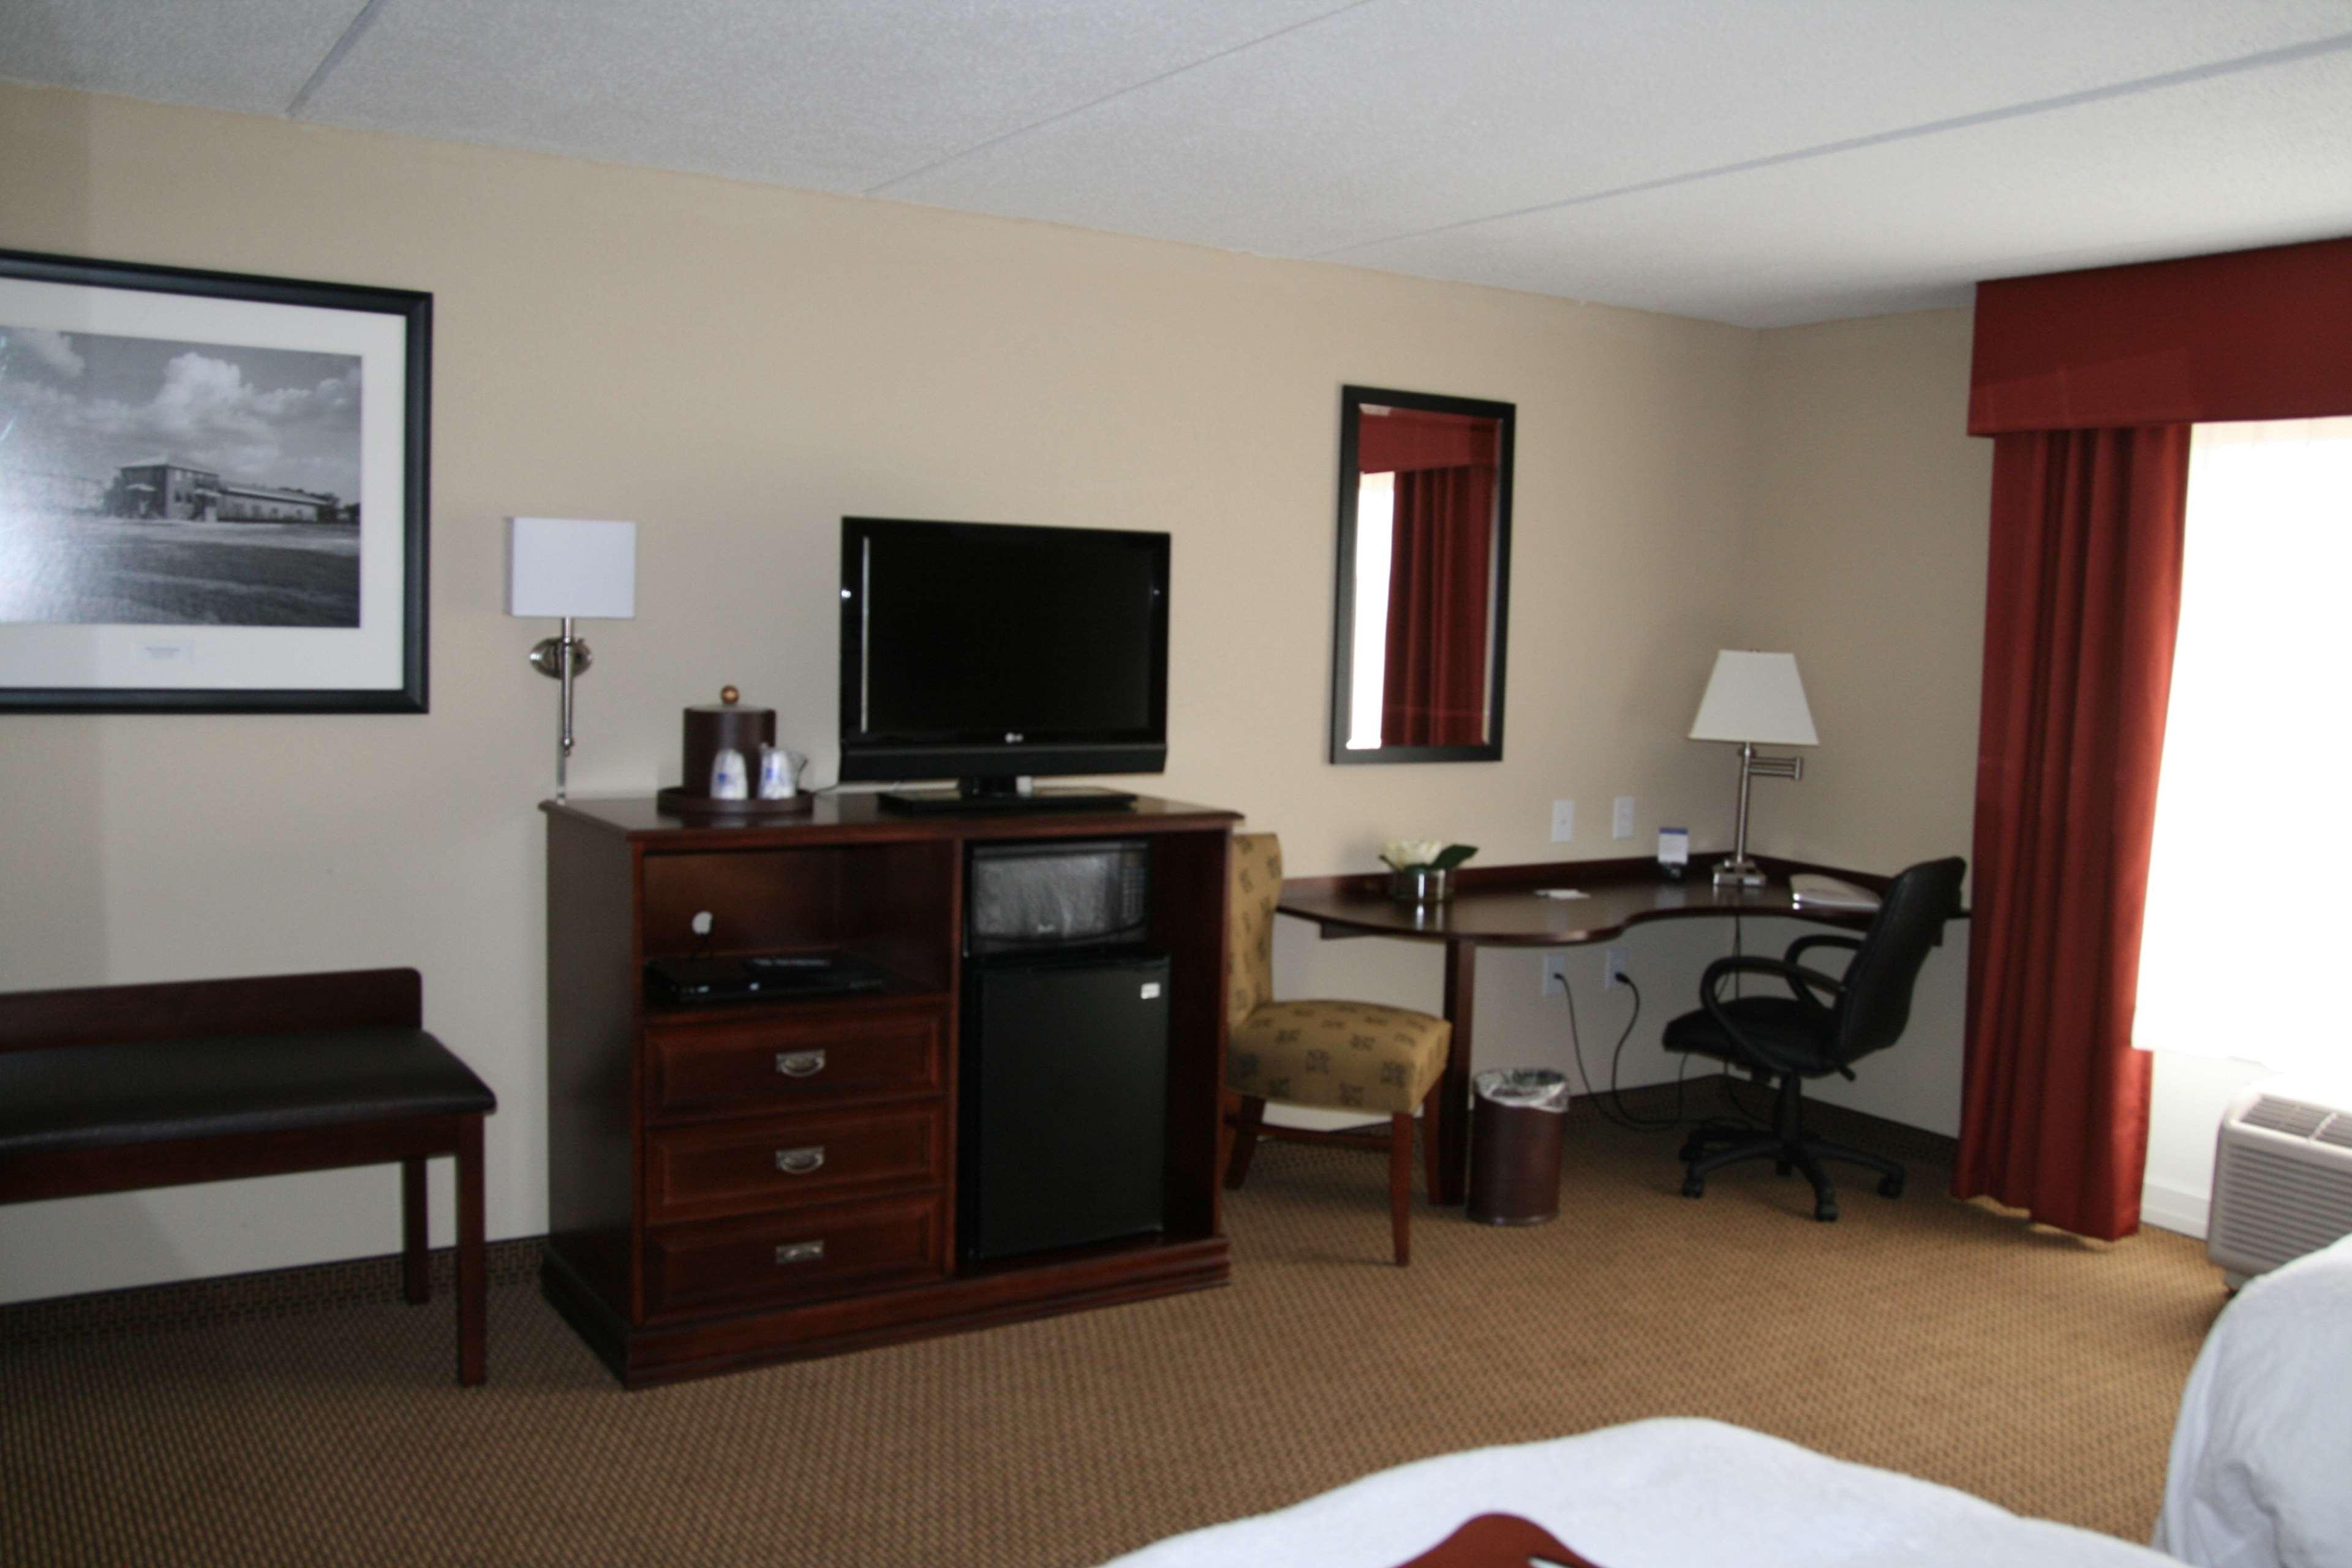 Hampton Inn & Suites Lanett-West Point image 24